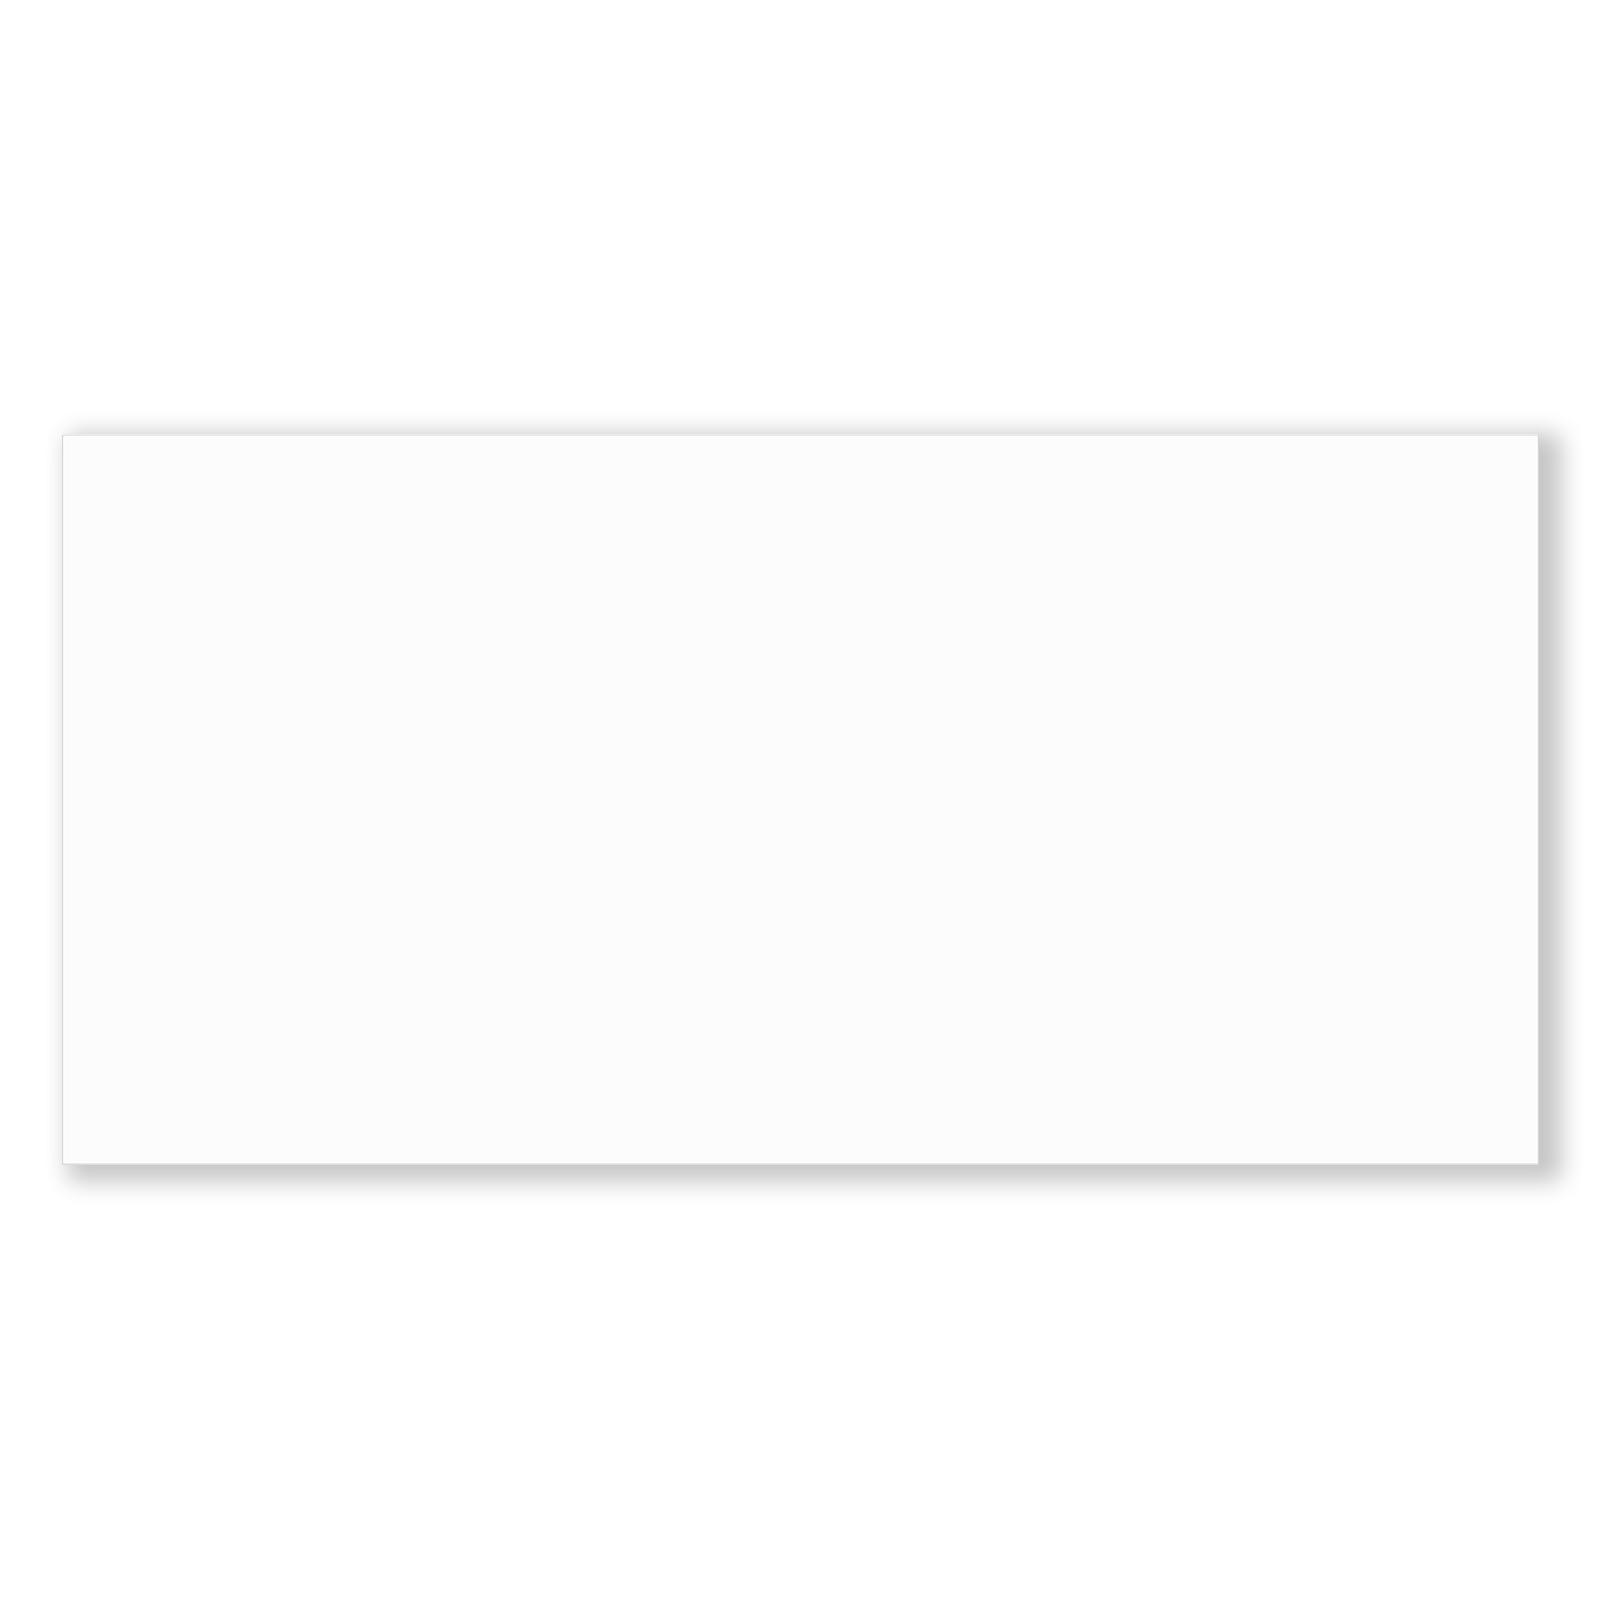 Duratile 60 x 30cm White Gloss Ceramic Wall Tile - 8 Carton